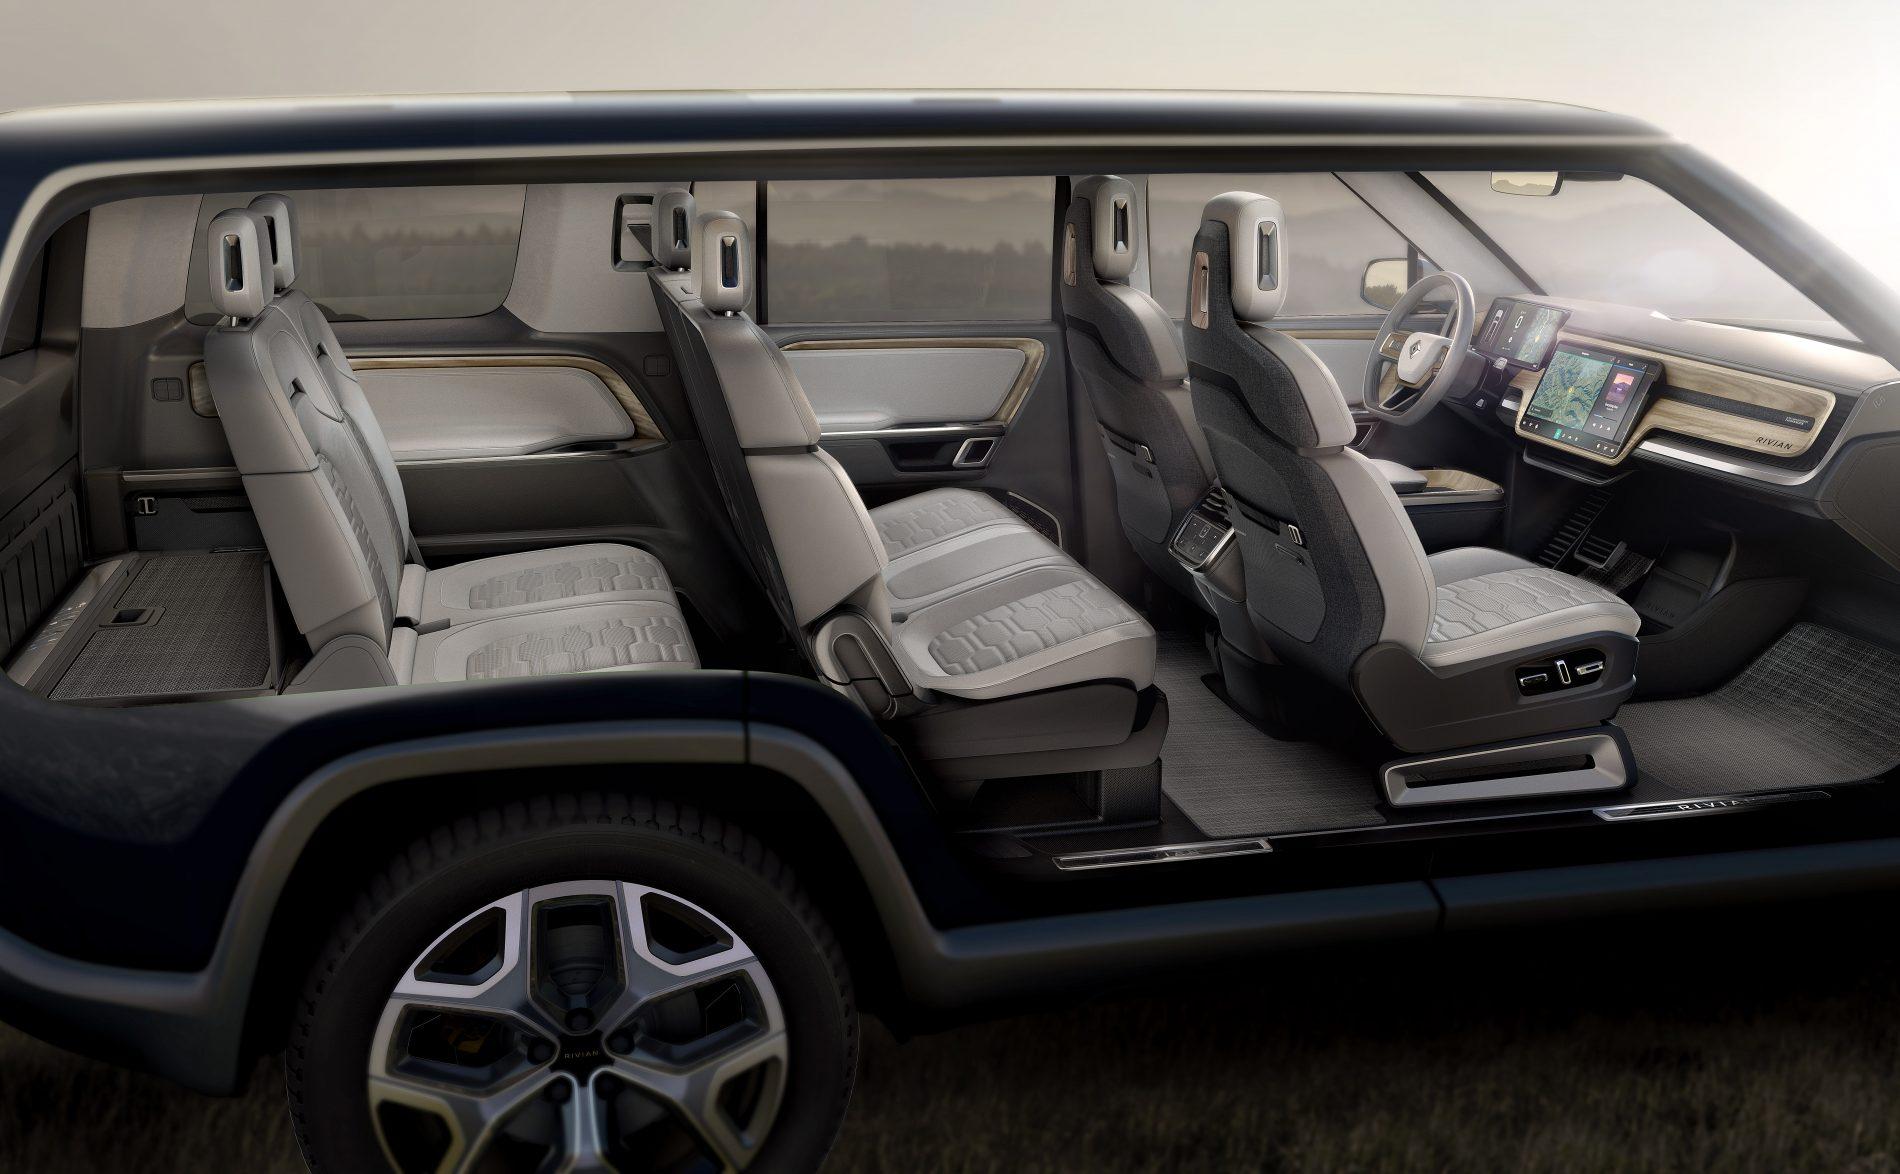 c-rivian-r1s-interior-cutaway-e1543093765105.jpg